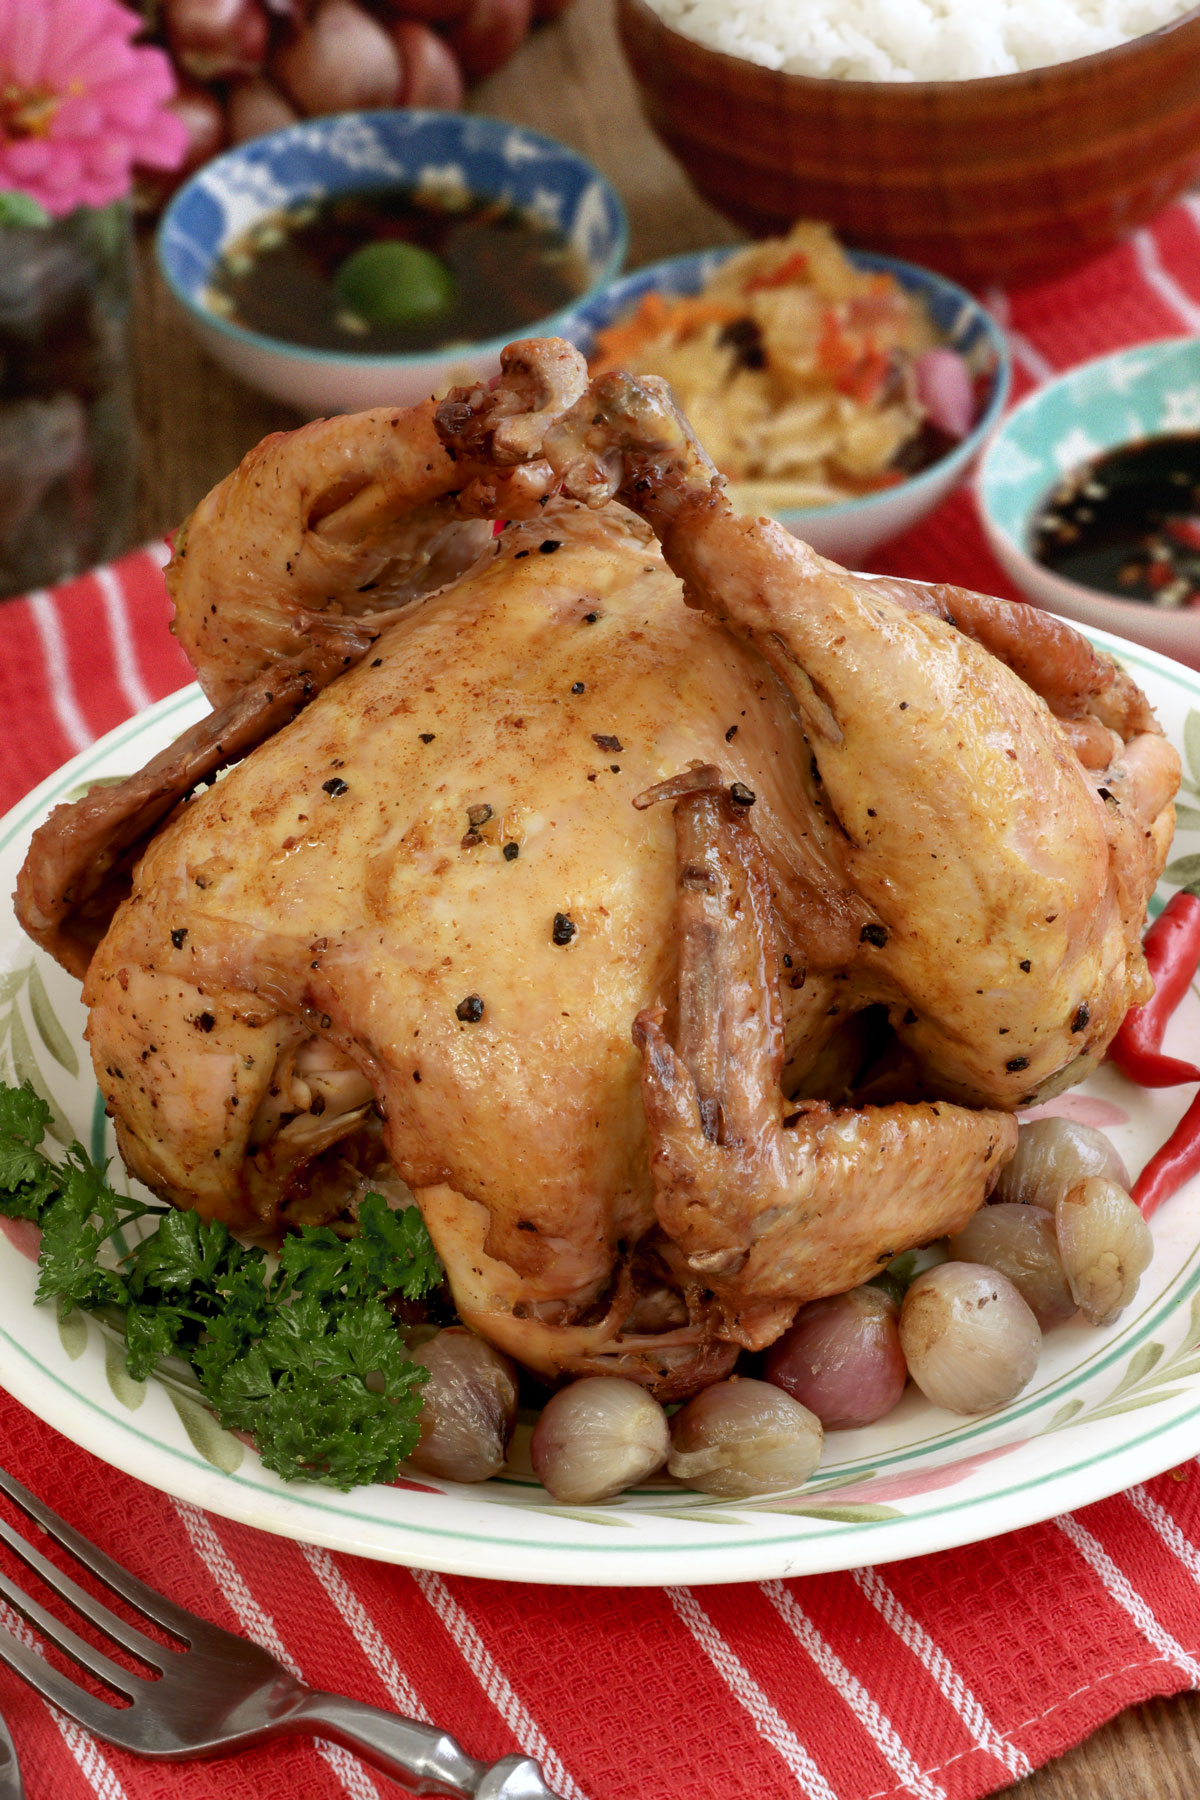 Pinaupong manok sa Asin - roasted chicken cooked in a pot.